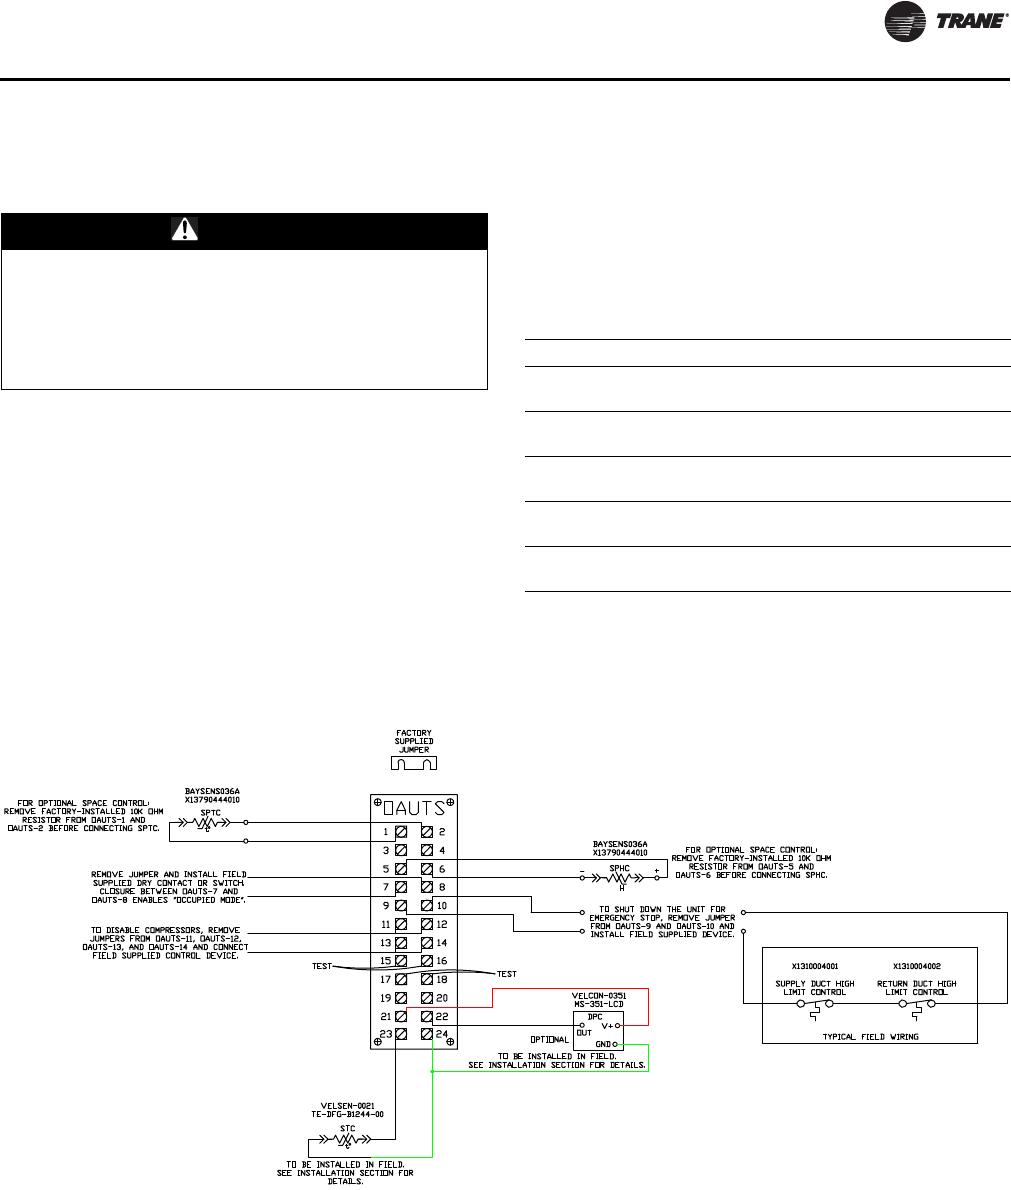 hight resolution of international 9600 wiring schematics international 9300 for chrome wiring diagram elsalvadorla international 9900i trucks short stacks international 9900i